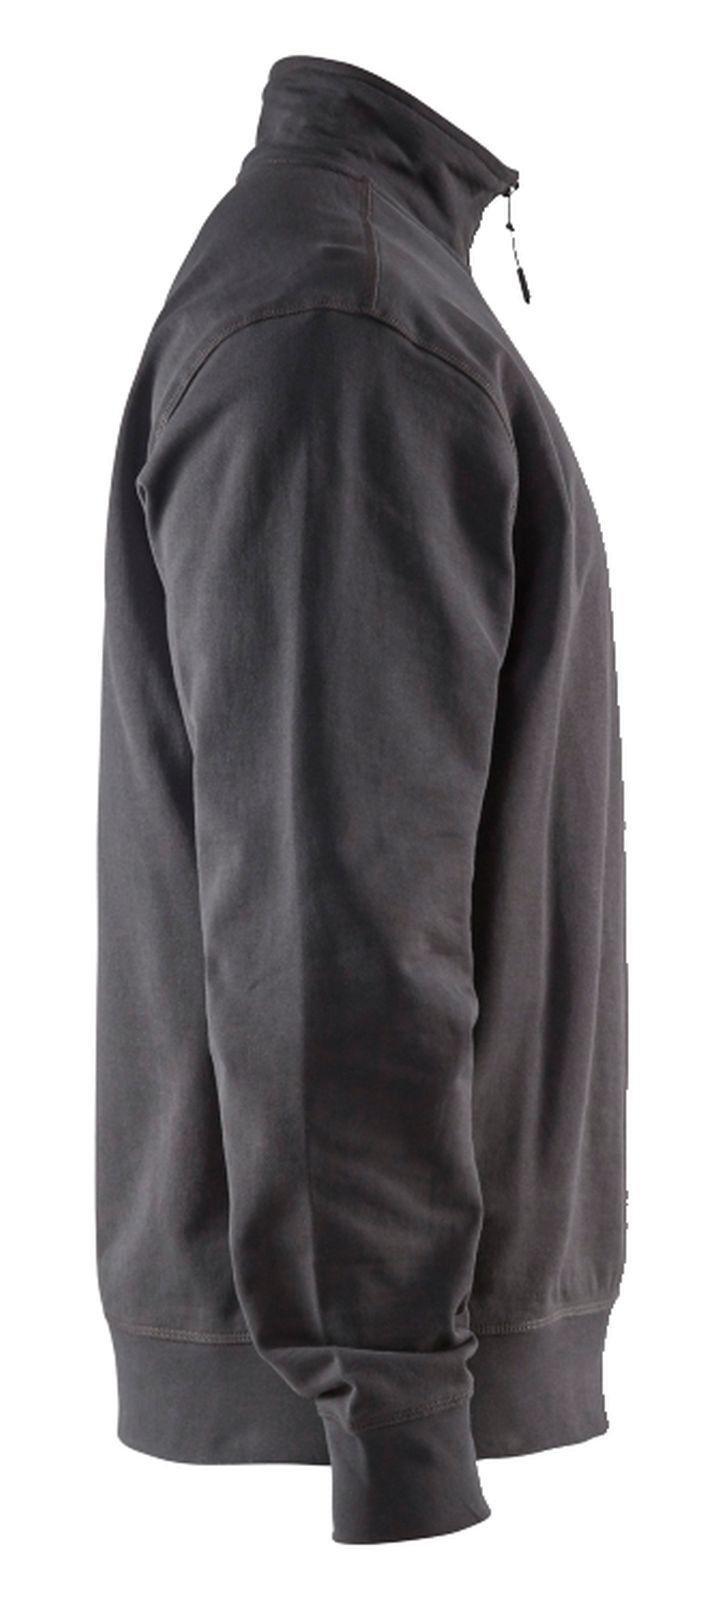 Blaklader Sweatshirts 33691158 donkergrijs(9800)